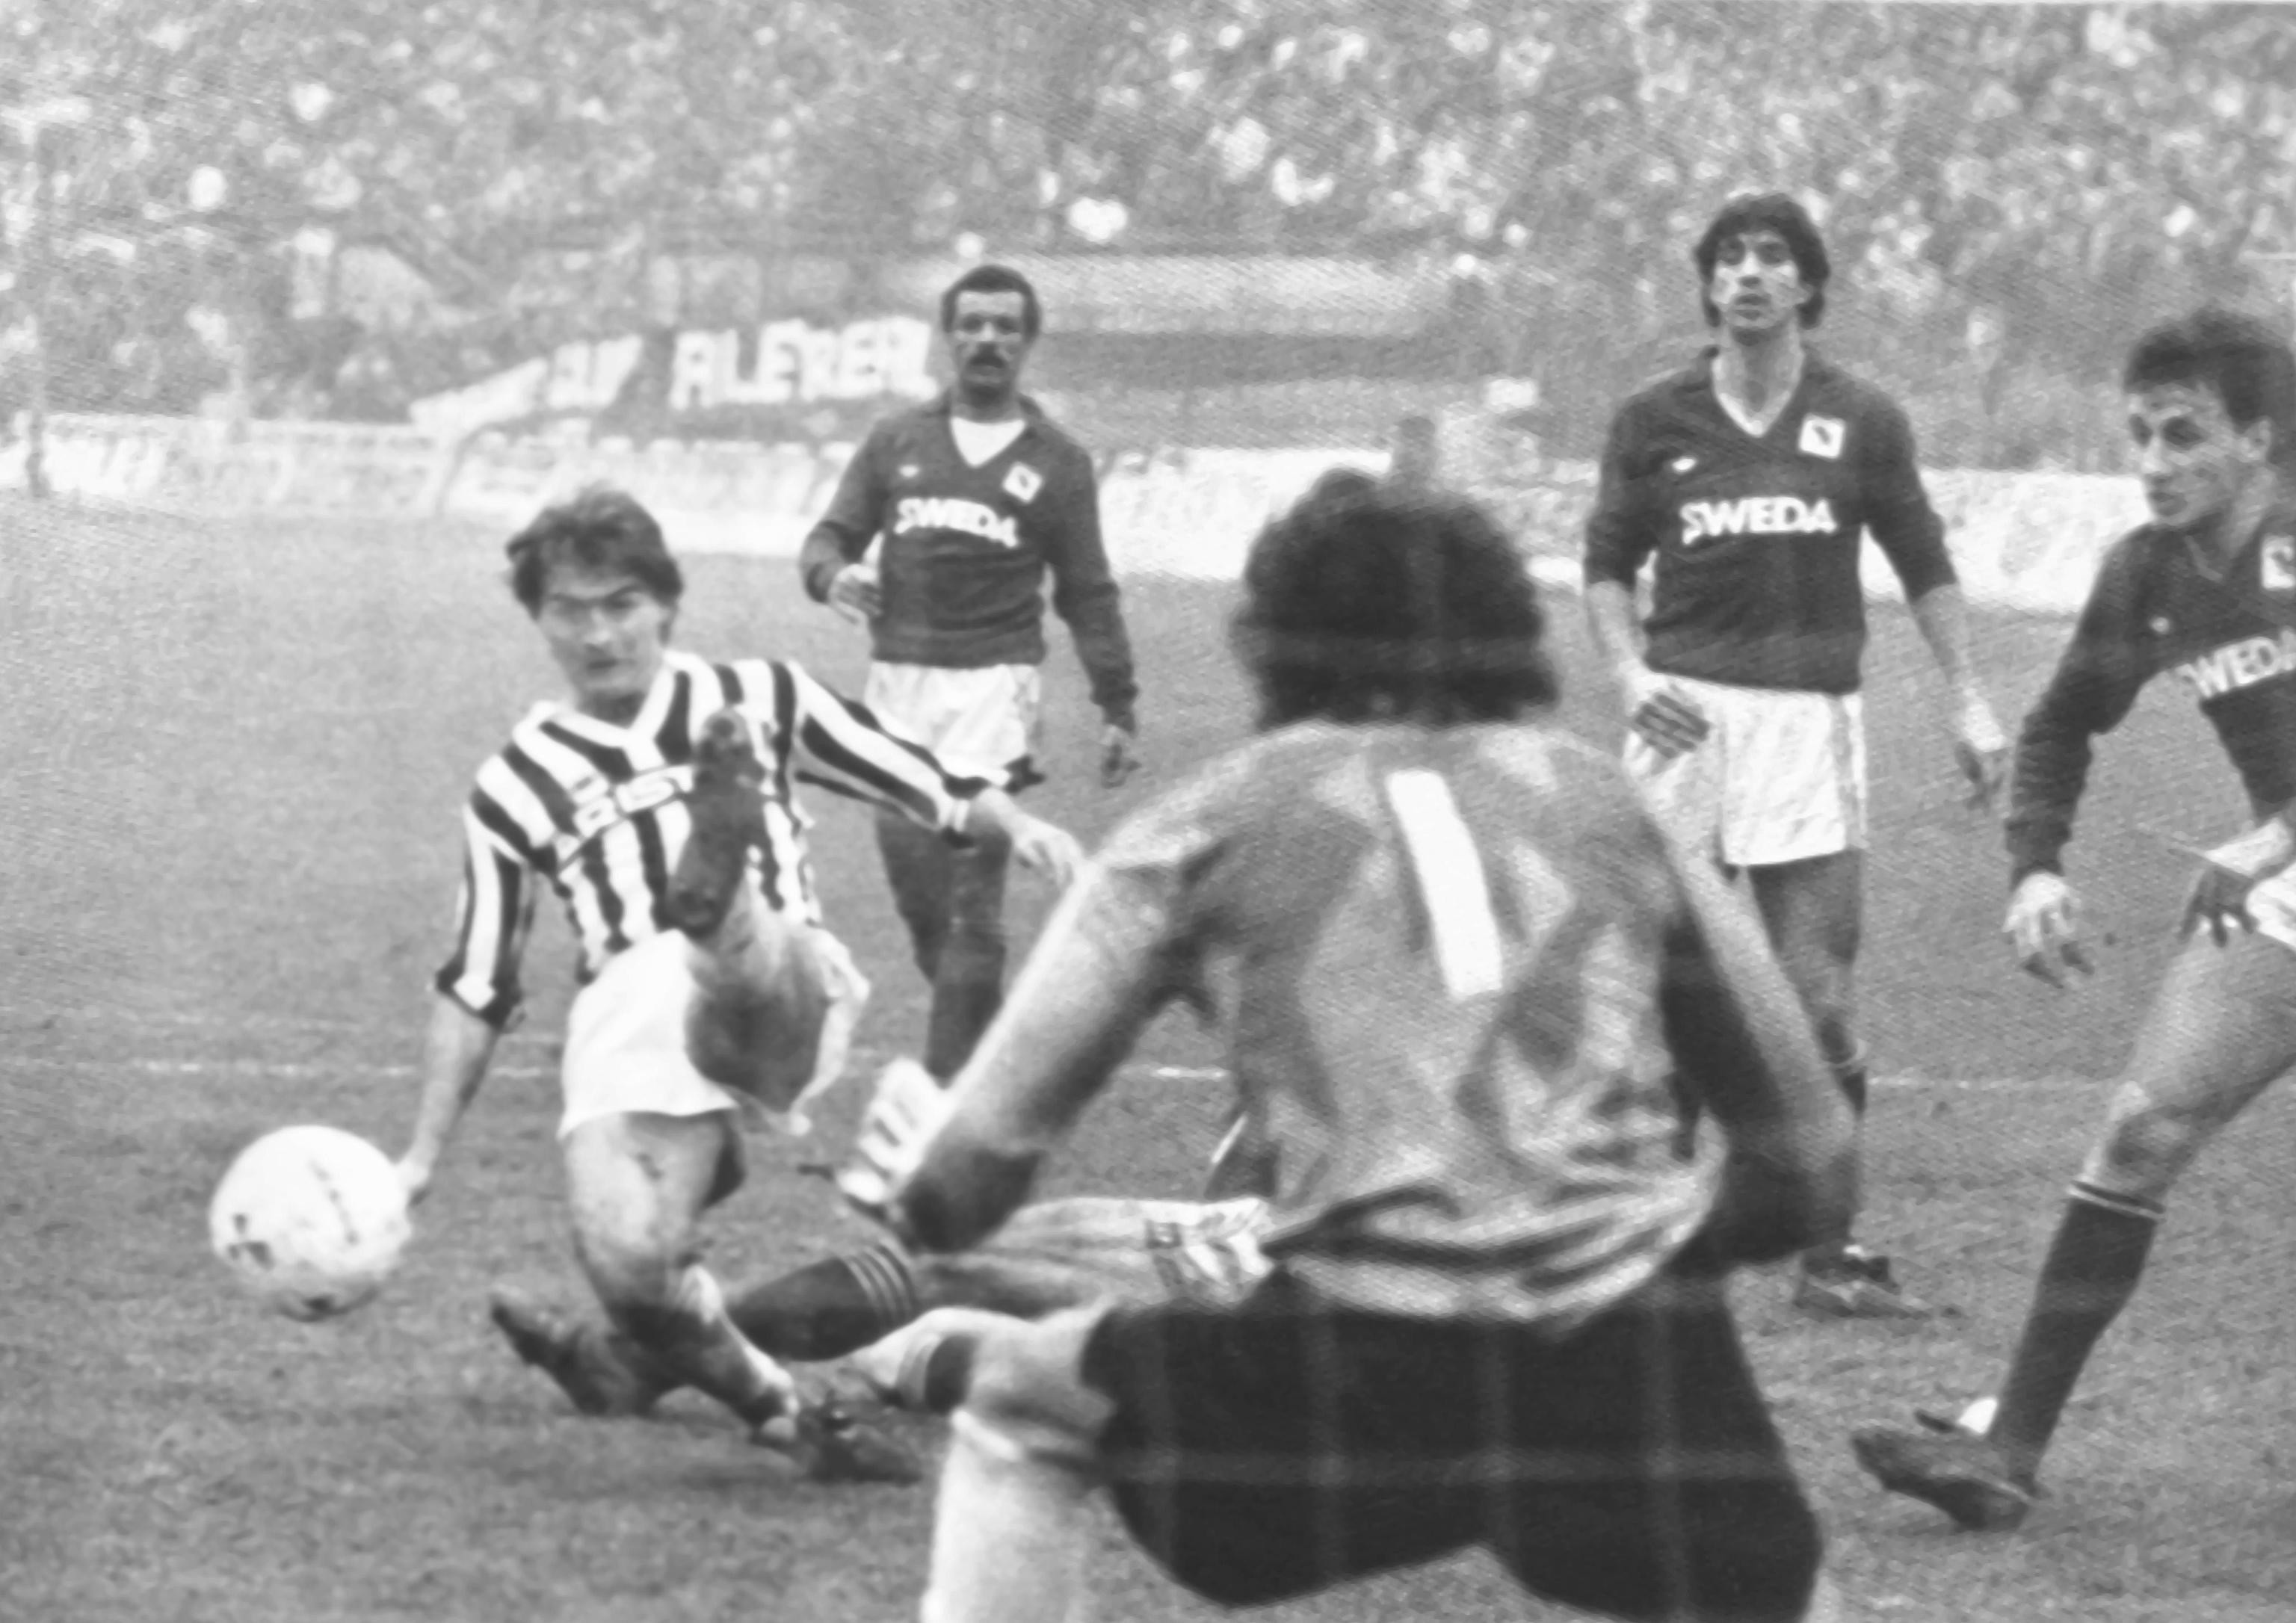 Lionello Manfredonia (1985-87 Juventus, 1987-90 Roma)